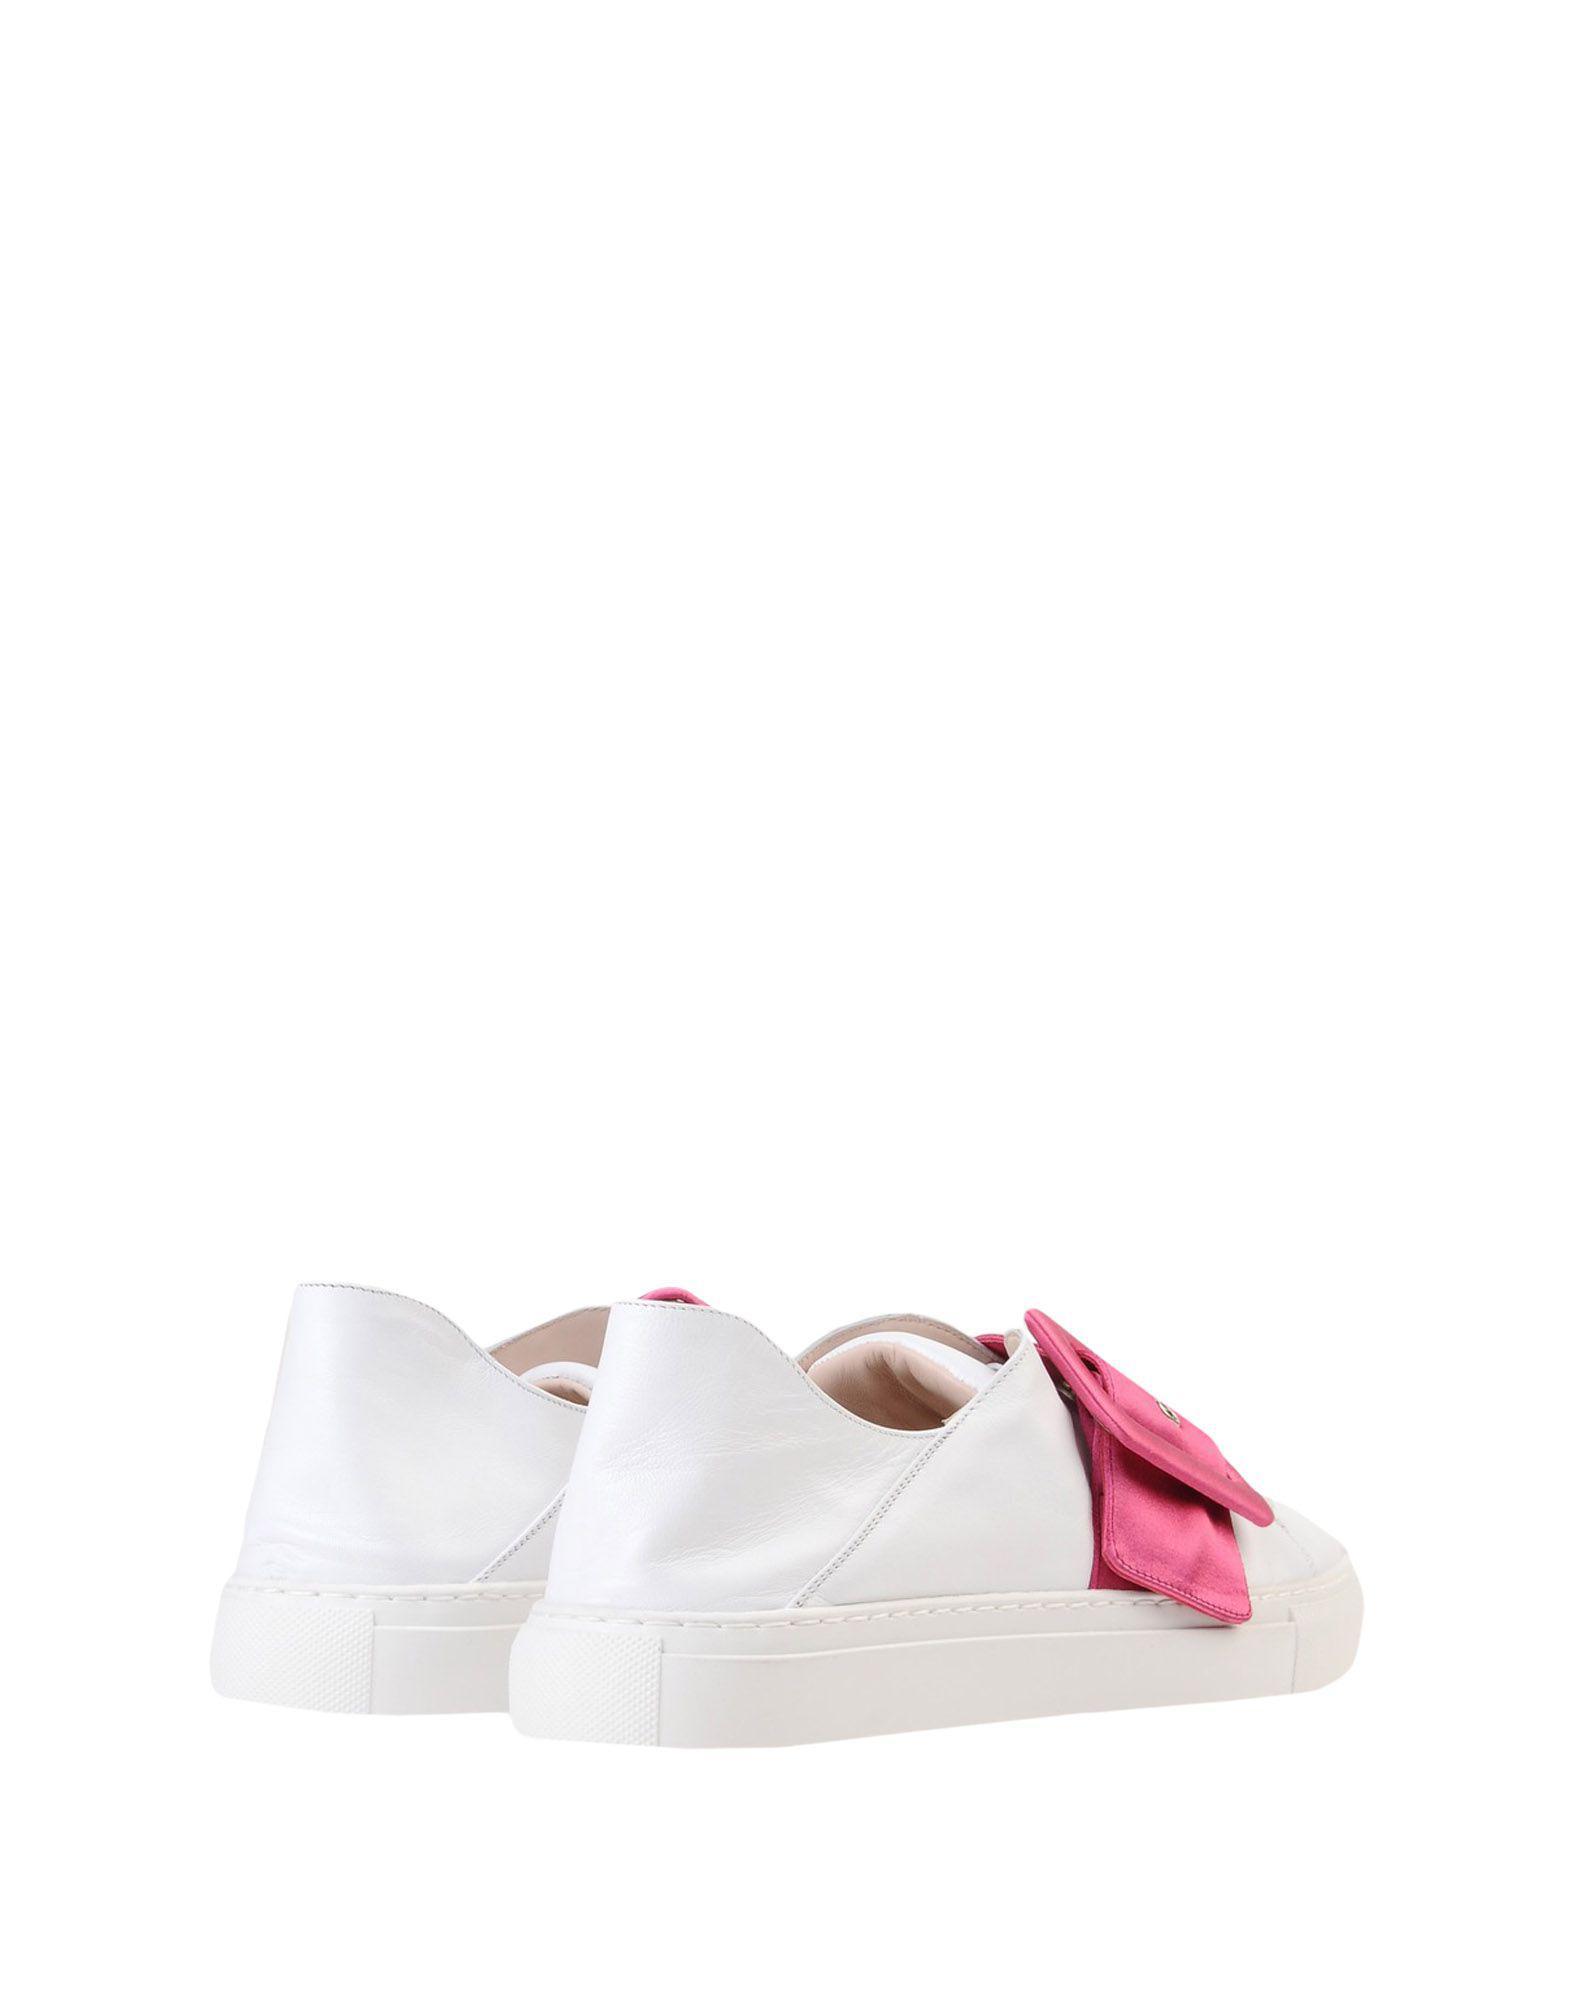 Minna Parikka Leather Low-tops & Sneakers